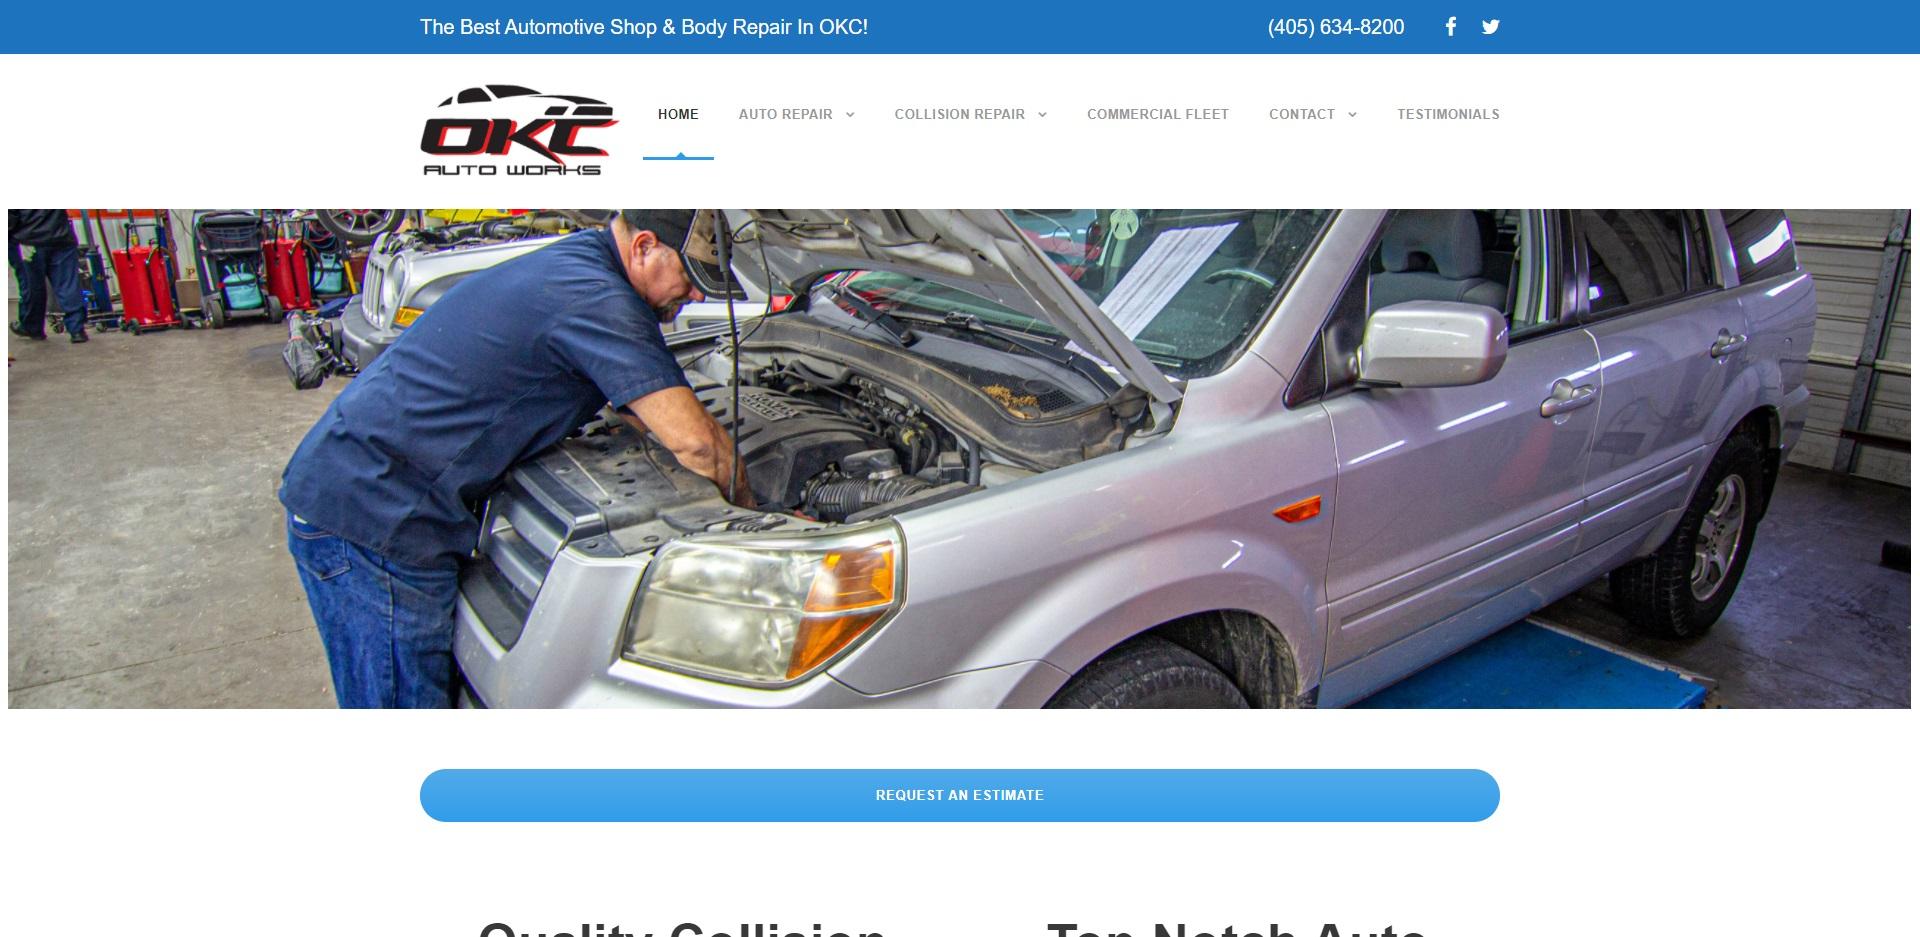 5 Best Mechanic Shops in Oklahoma City, OK